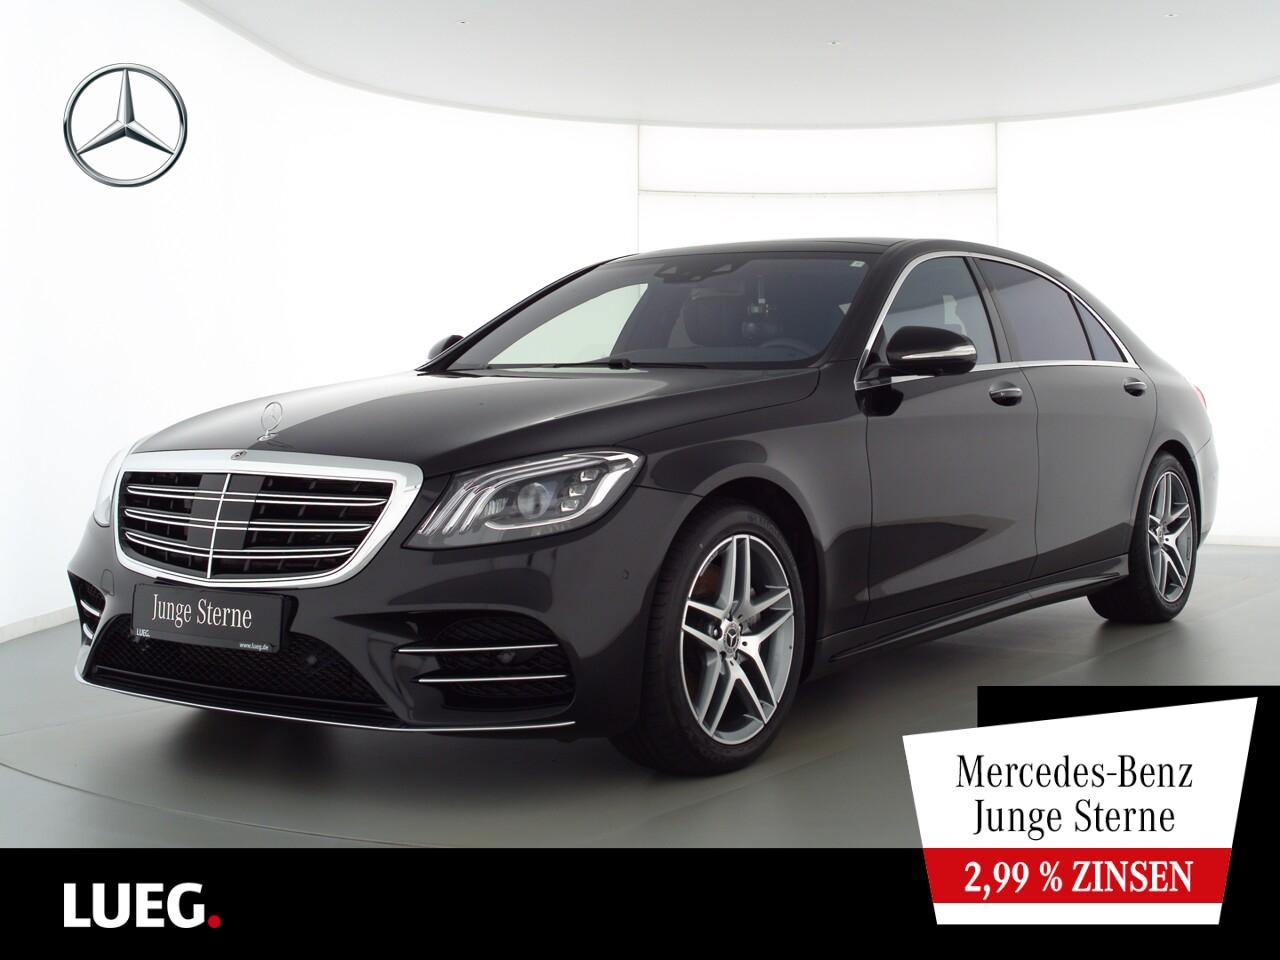 Mercedes-Benz S 500 L AMG+Sitzklima+Fond-tv+Designo+Burmester, Jahr 2020, Benzin